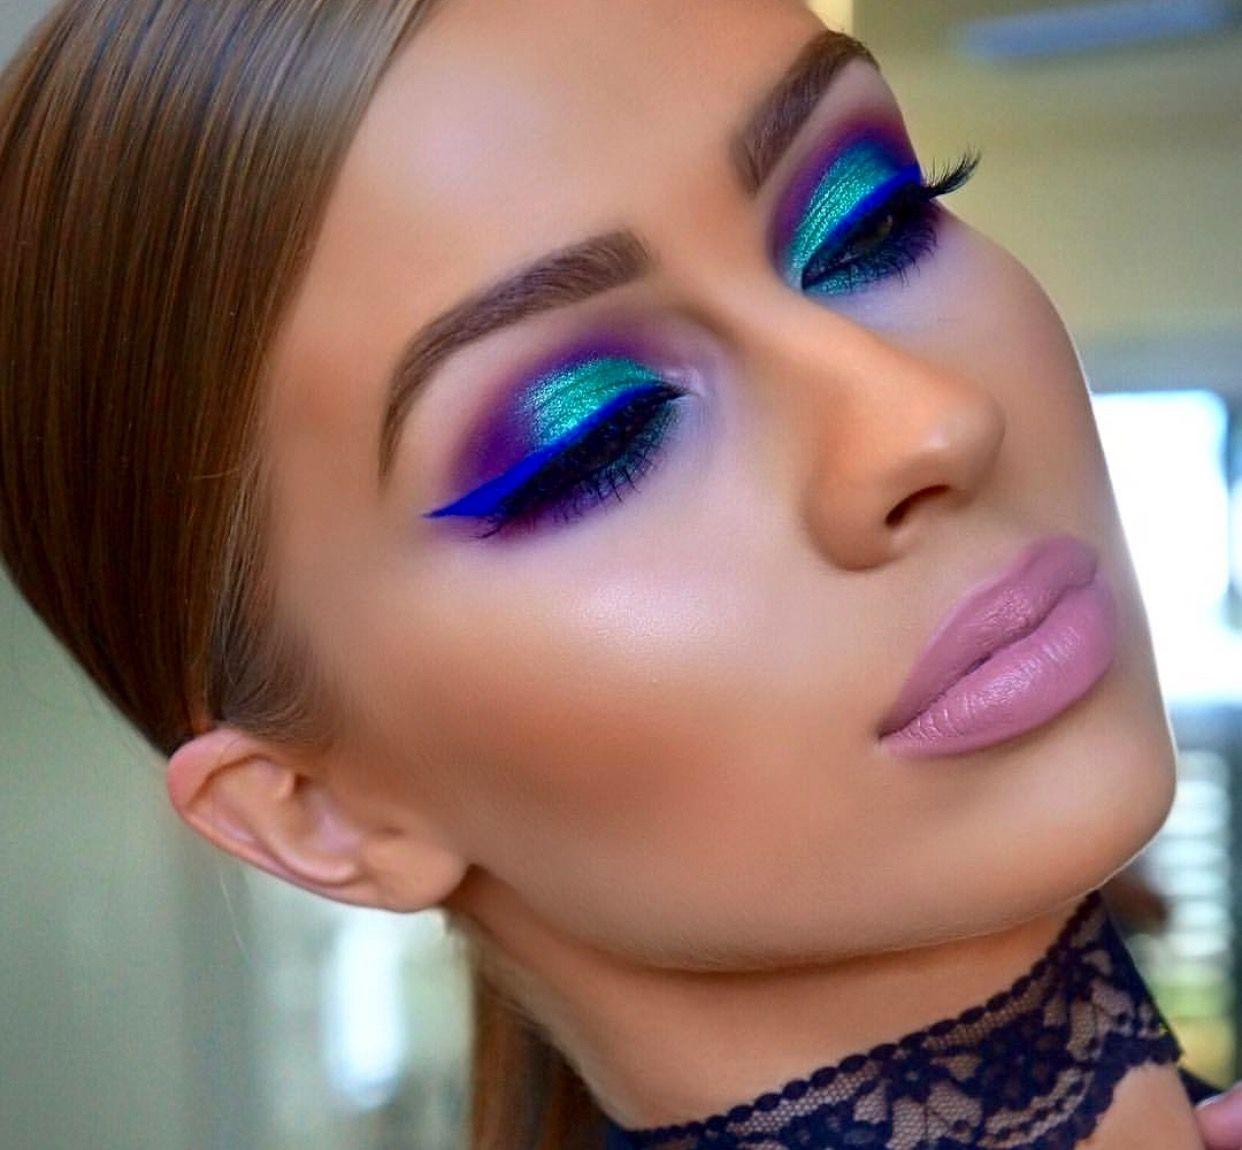 Gorgeous Eye Makeup Fun Colors Bright Eyeshadow Bright Liner